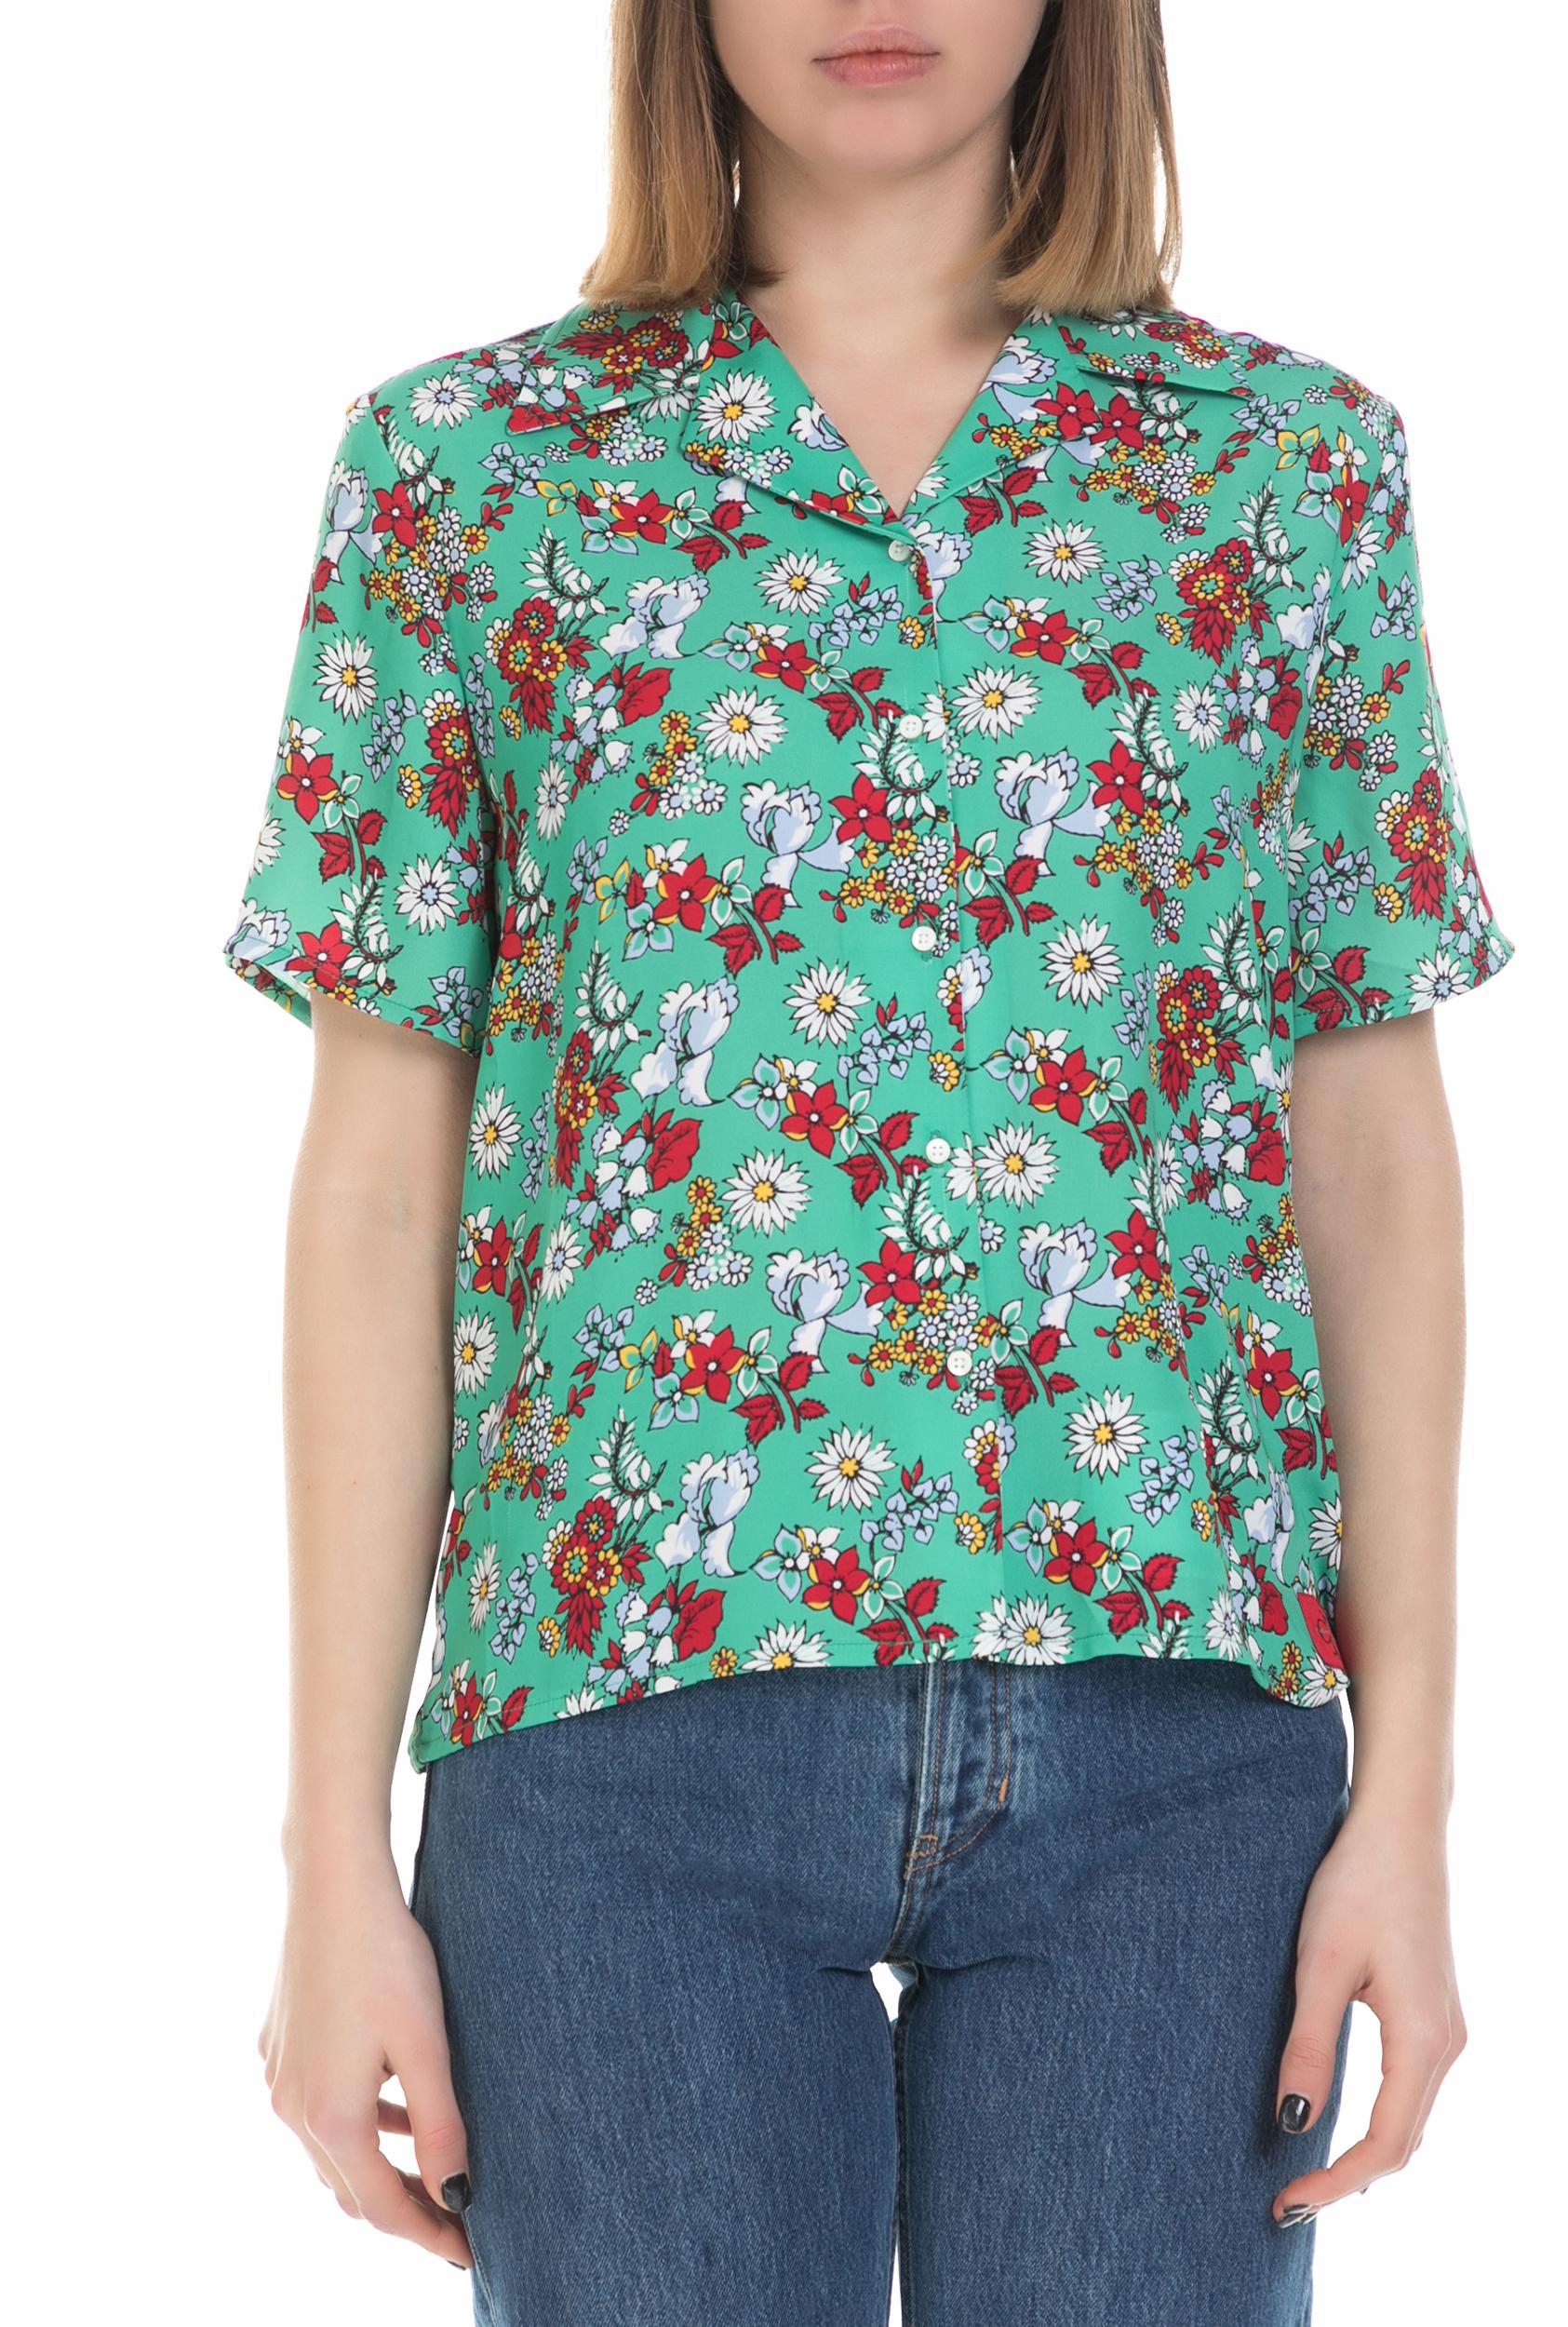 CALVIN KLEIN JEANS - Γυναικείο φλοράλ πουκάμισο Calvin Klein Jeans πράσινο